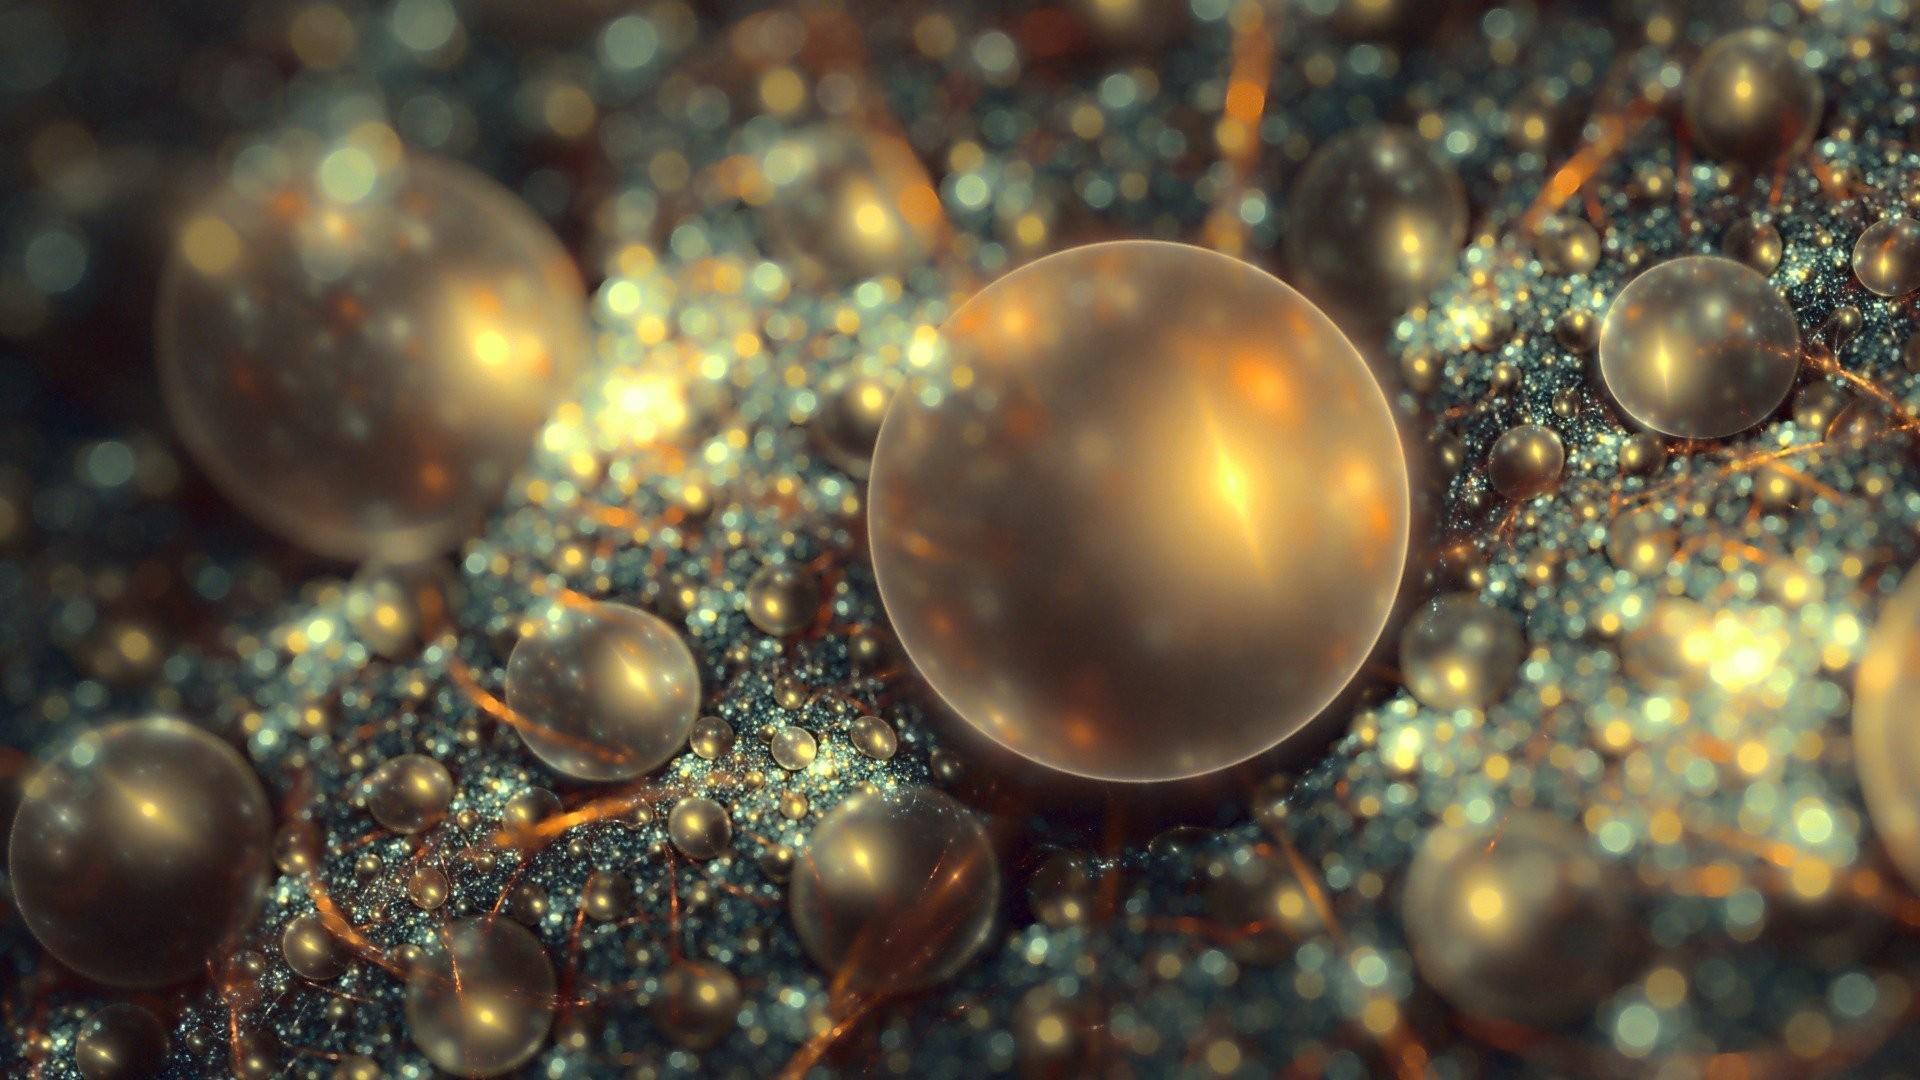 Jewelry Pearls Image